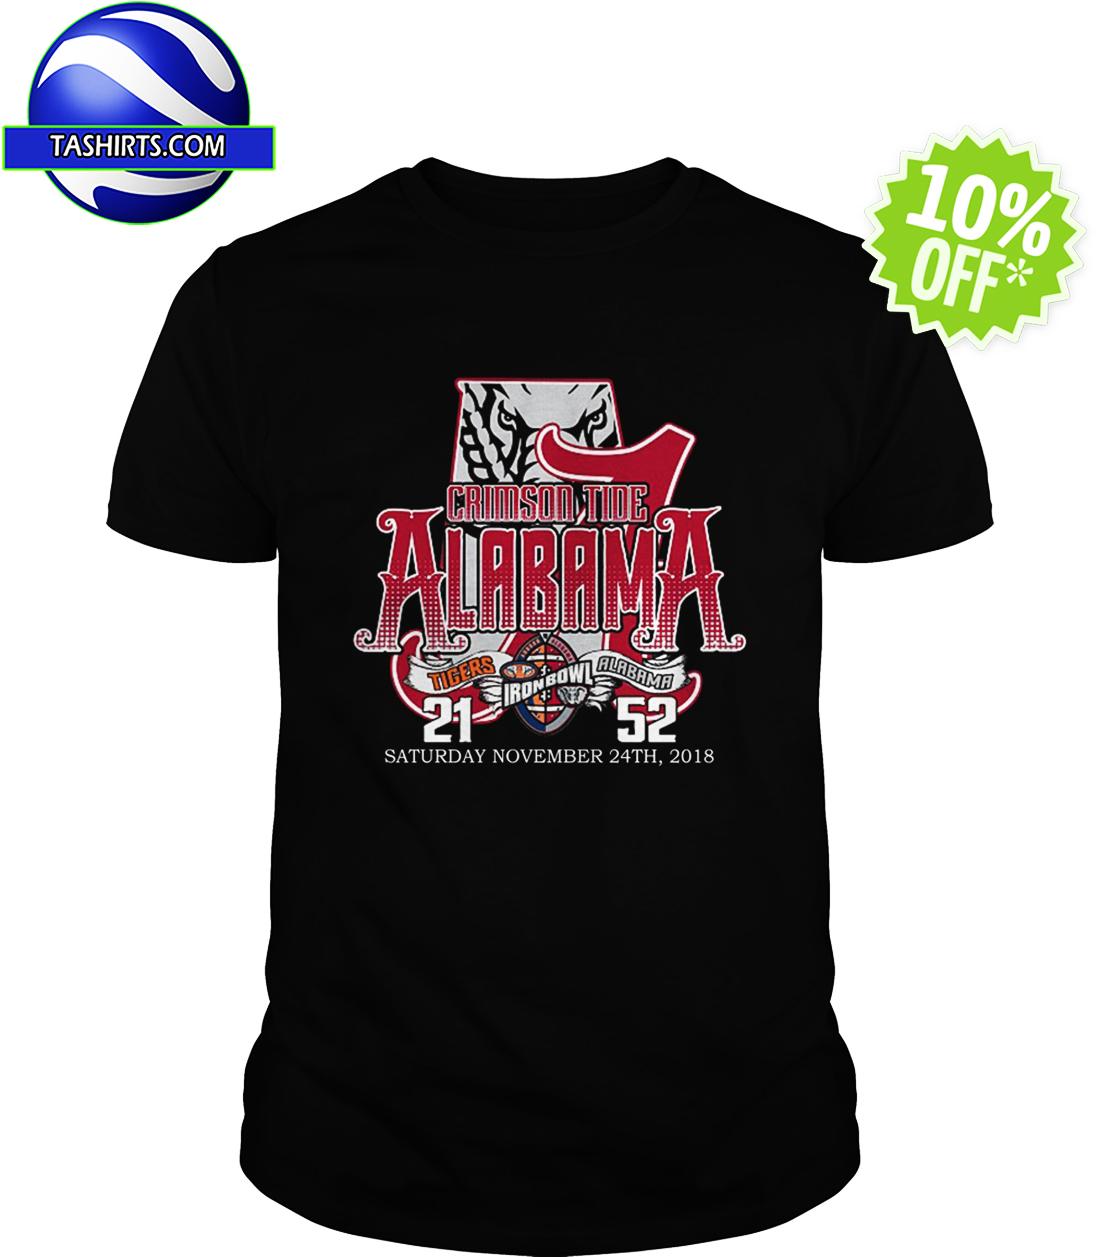 Crimson tide Alabama A tigers Iron Bowl Saturday November 24th 2018 shirt